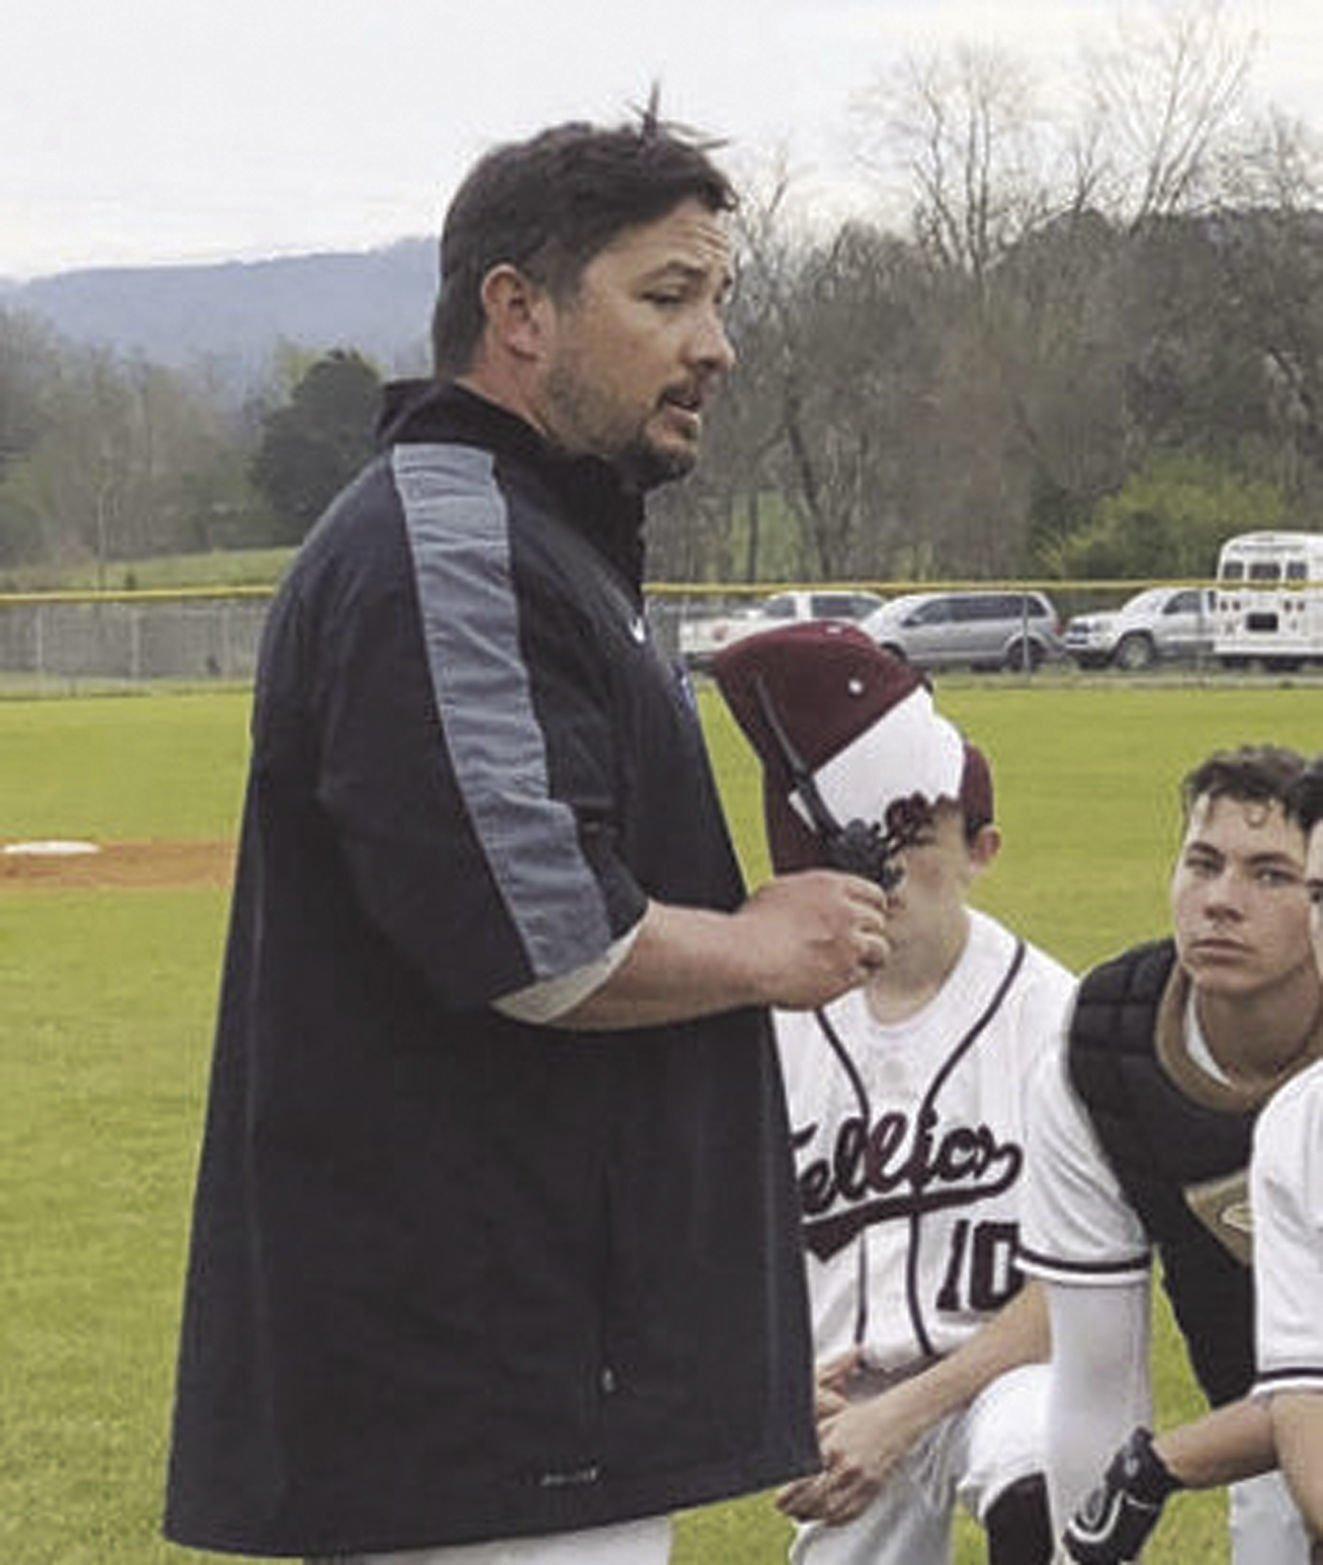 Record breaking seasons, stats define Monroe County baseball